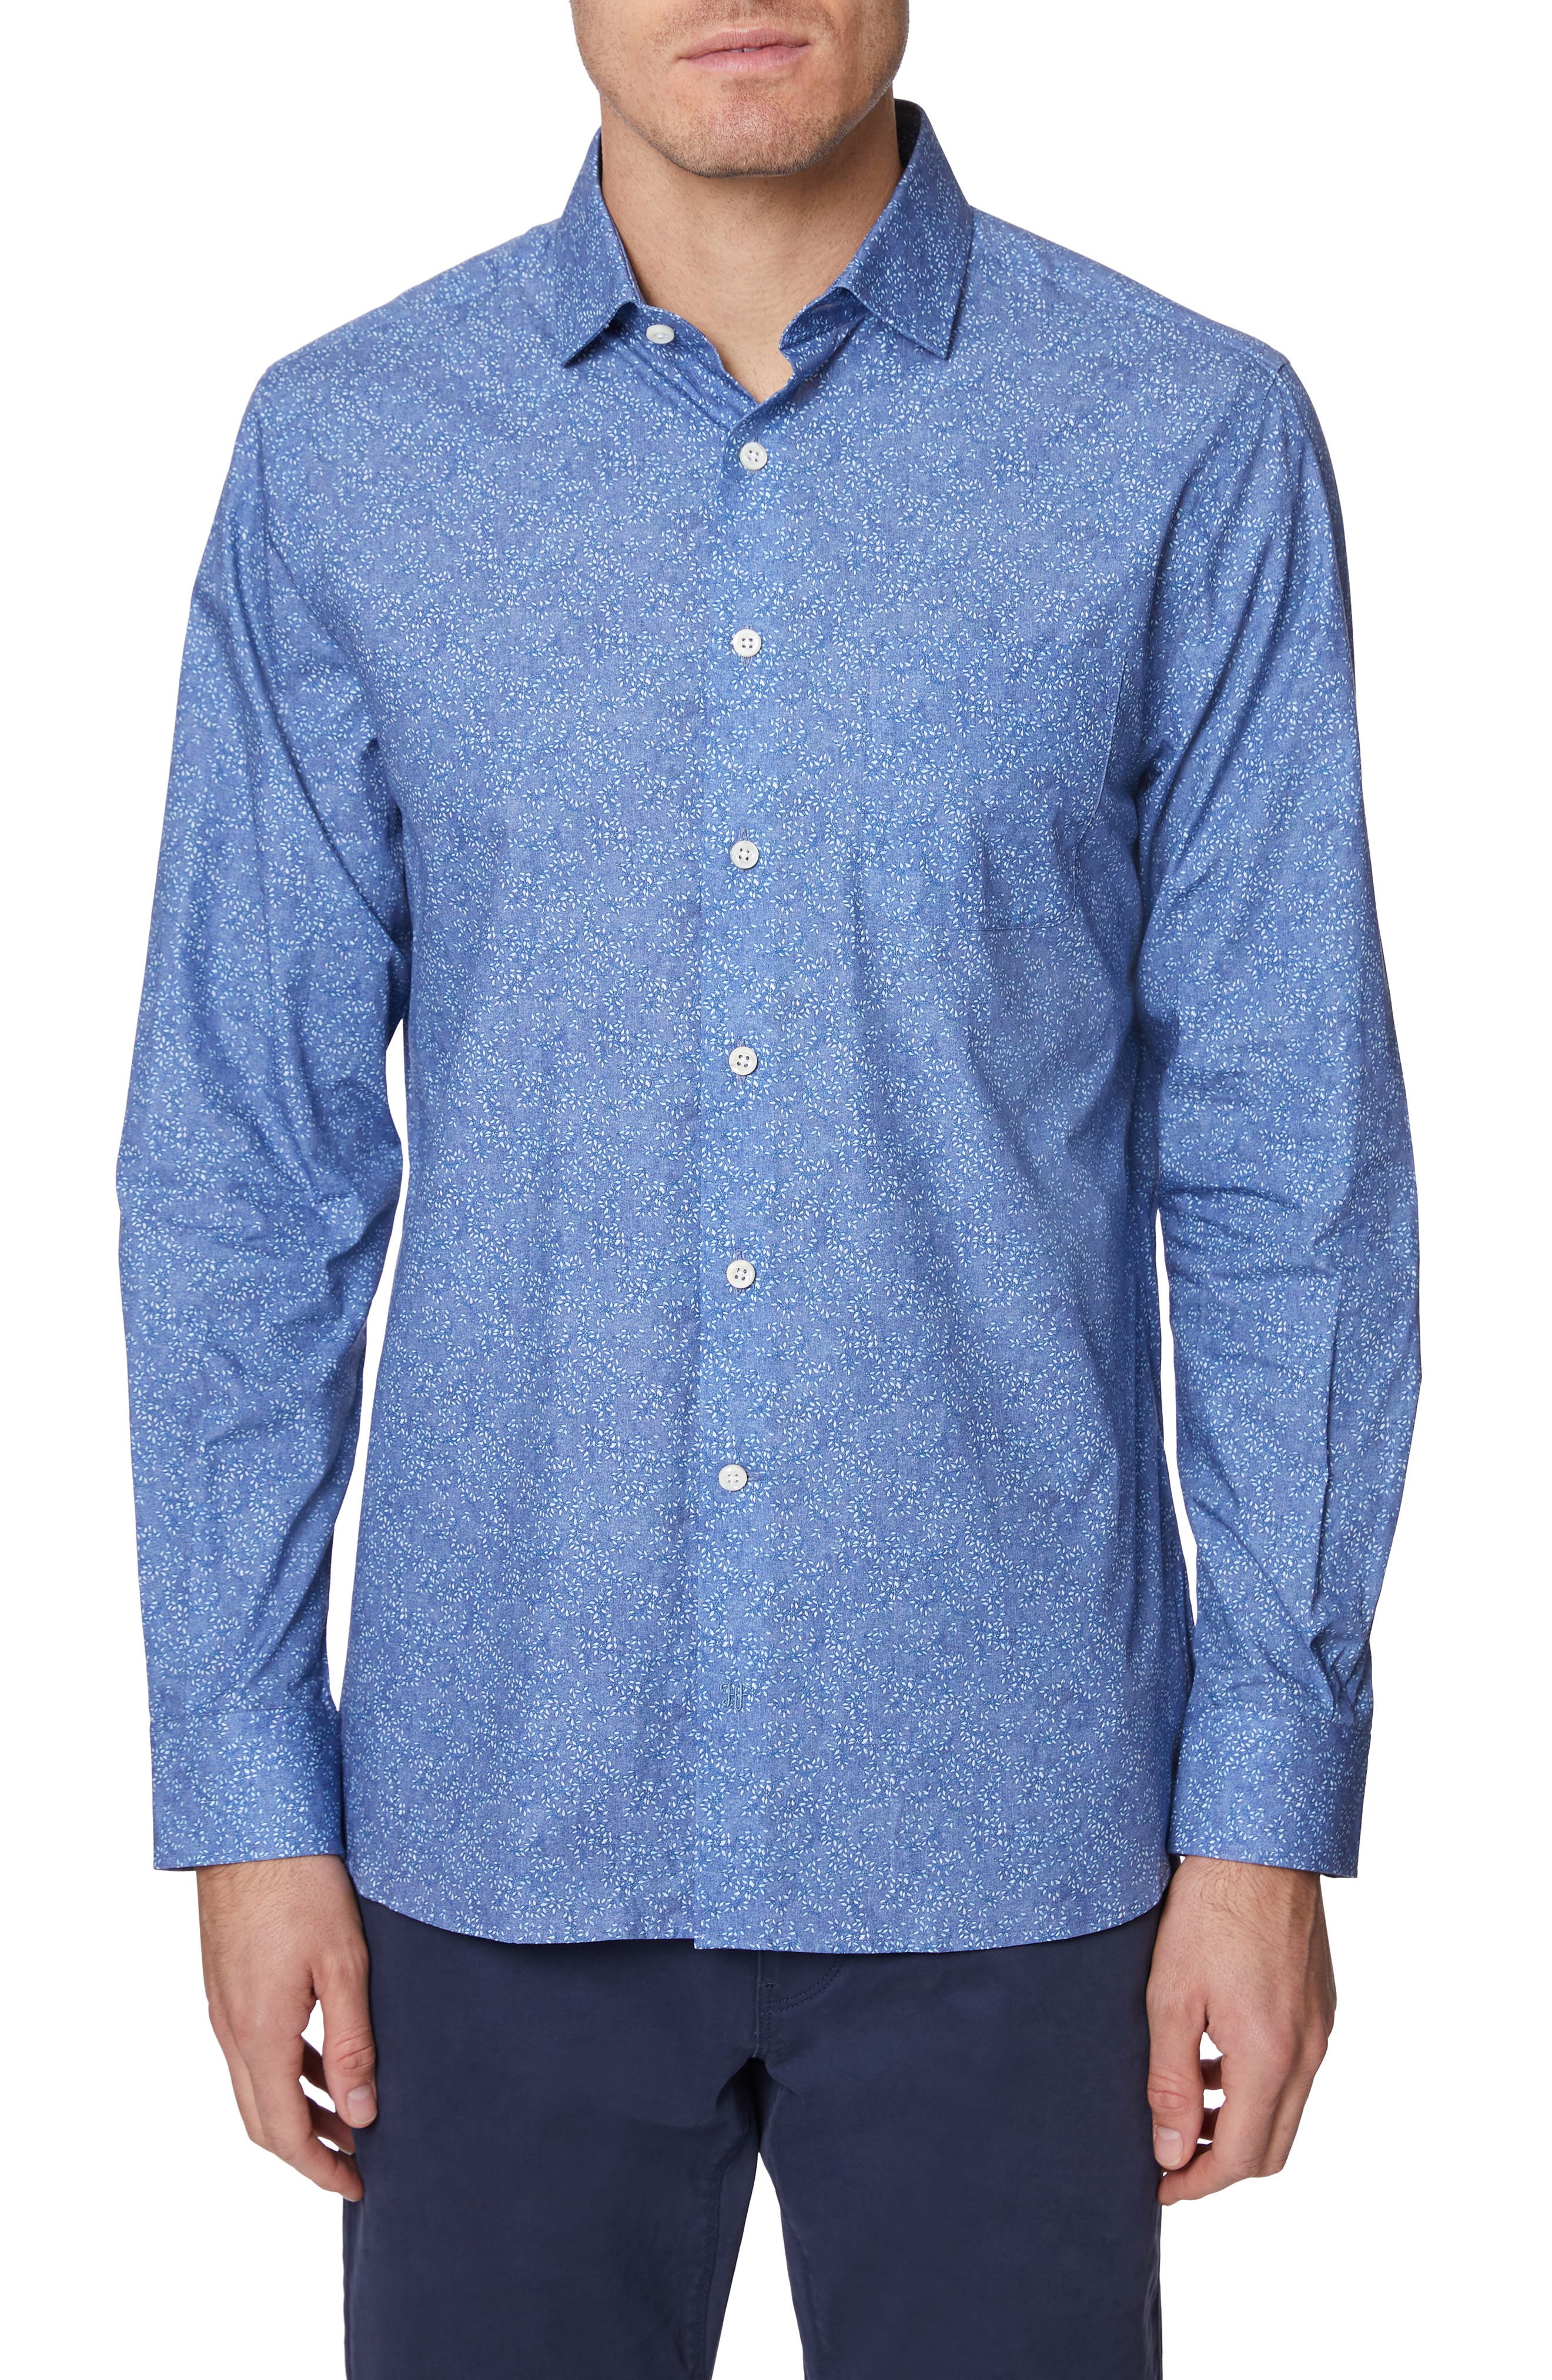 Image of Hickey Freeman Metropolitan Floral Button-Up Shirt